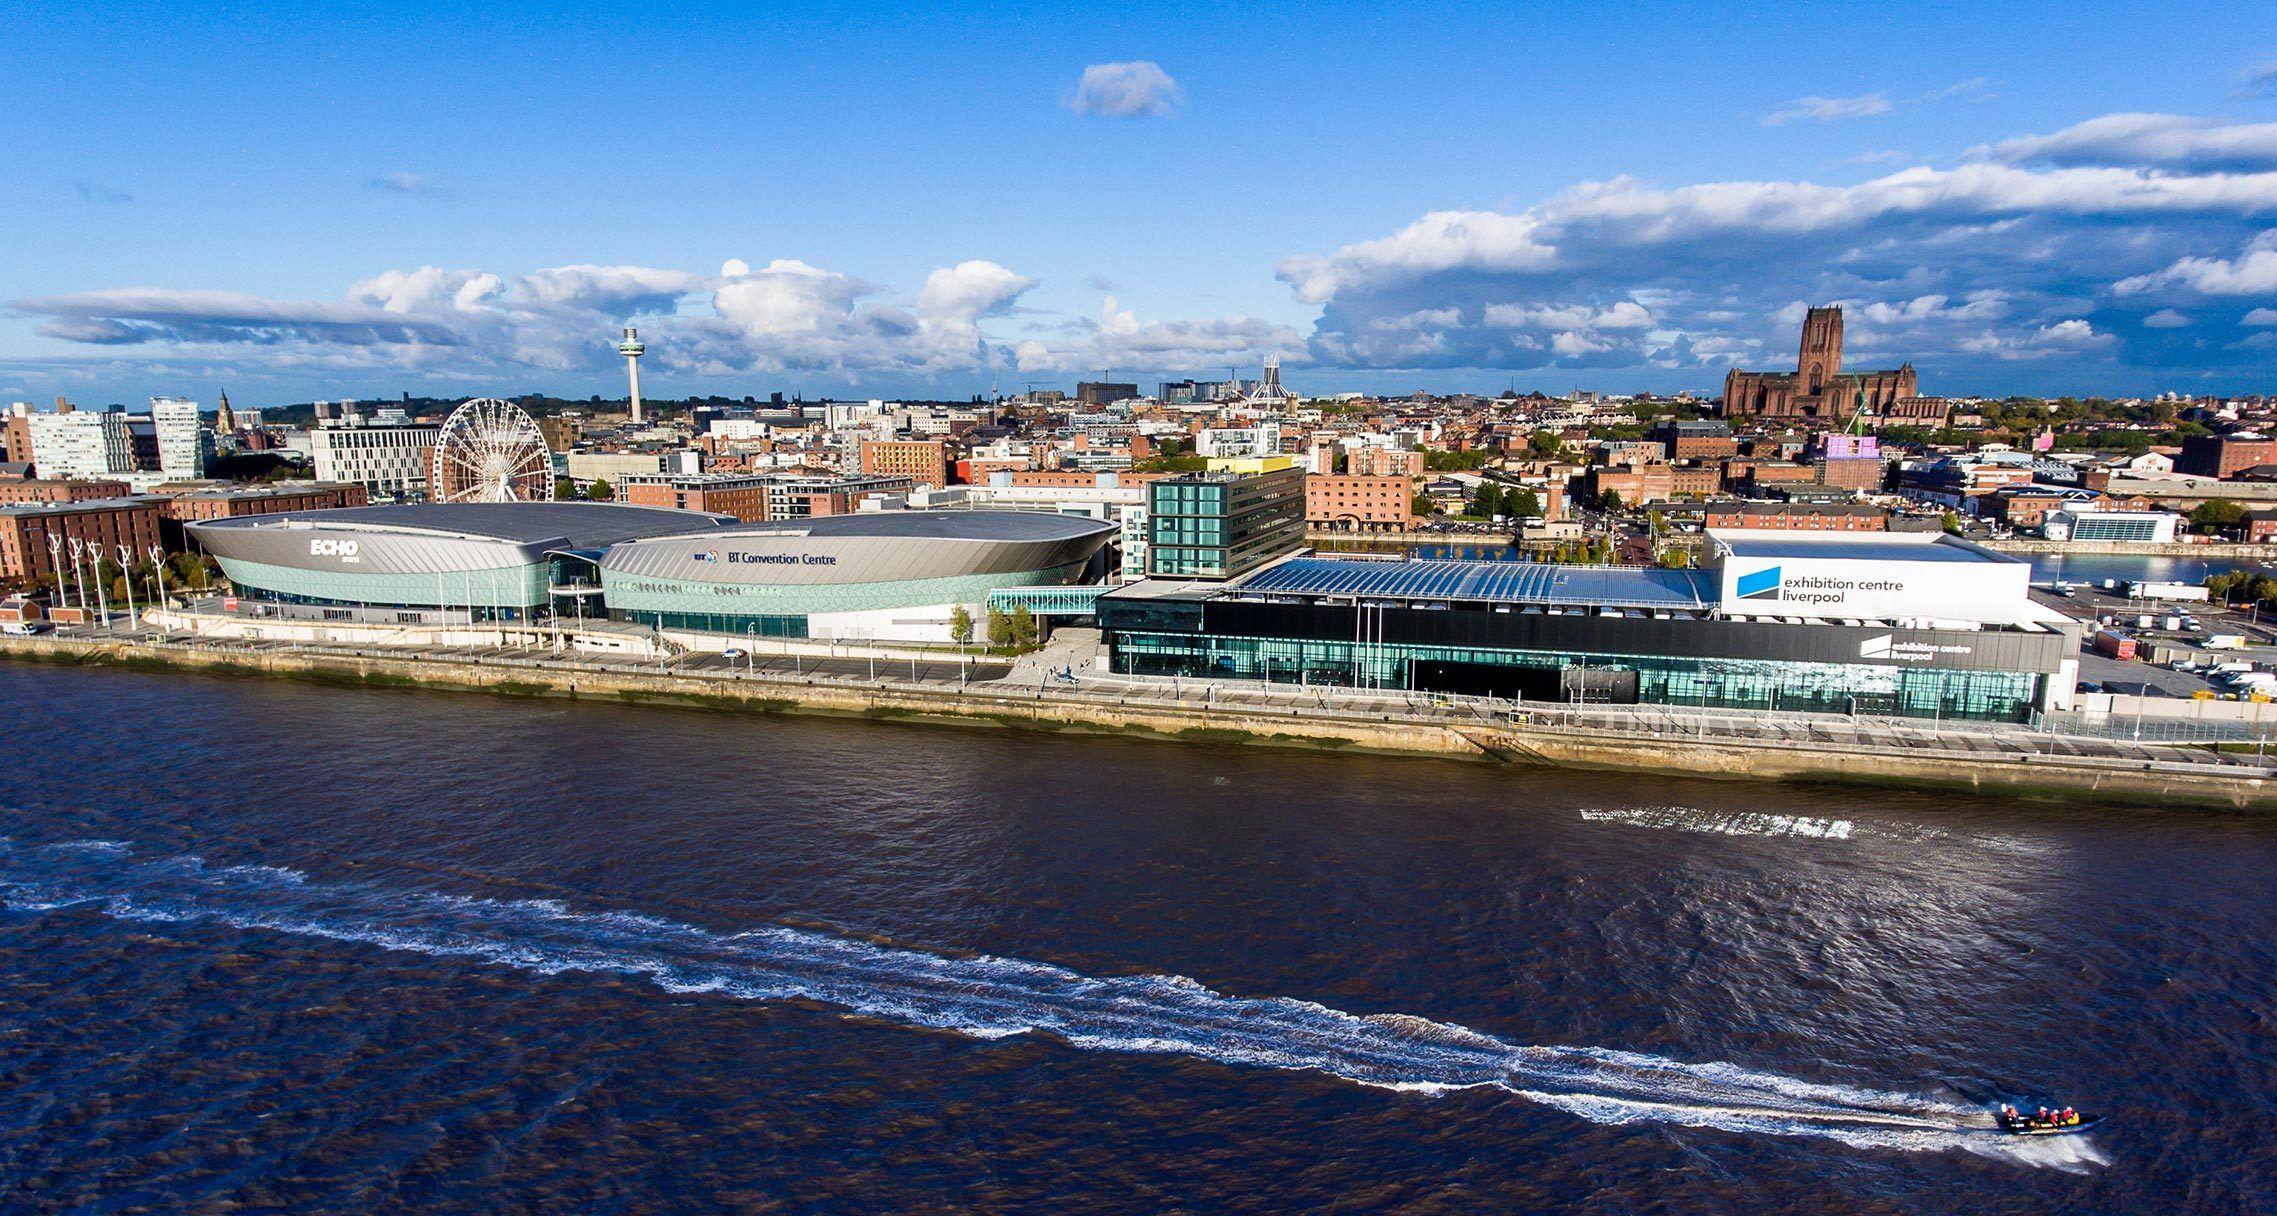 Liverpool Internet Exchange (IX Liverpool)